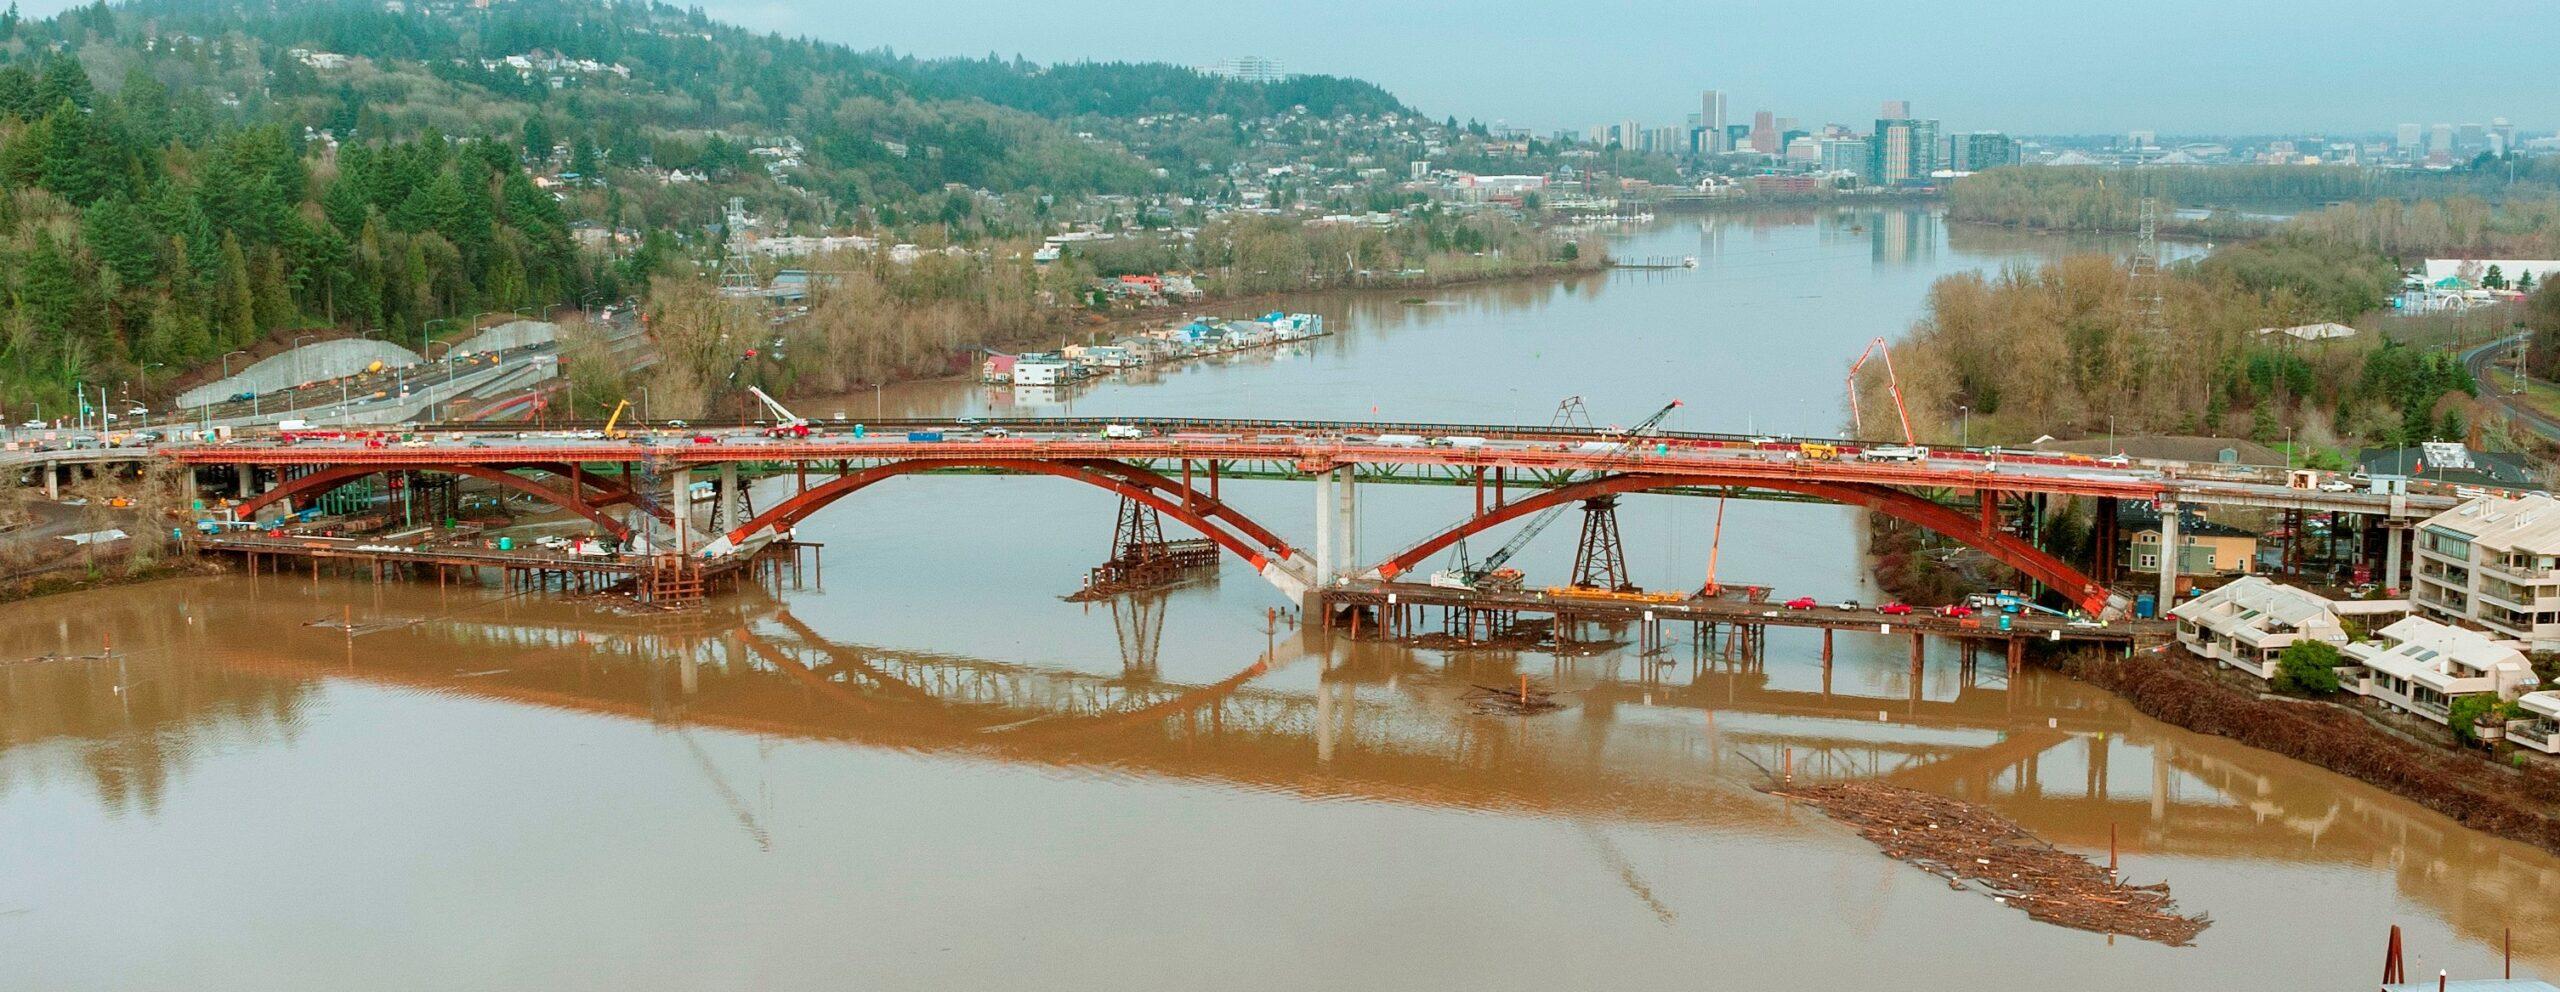 Sellwood Bridge Replacement